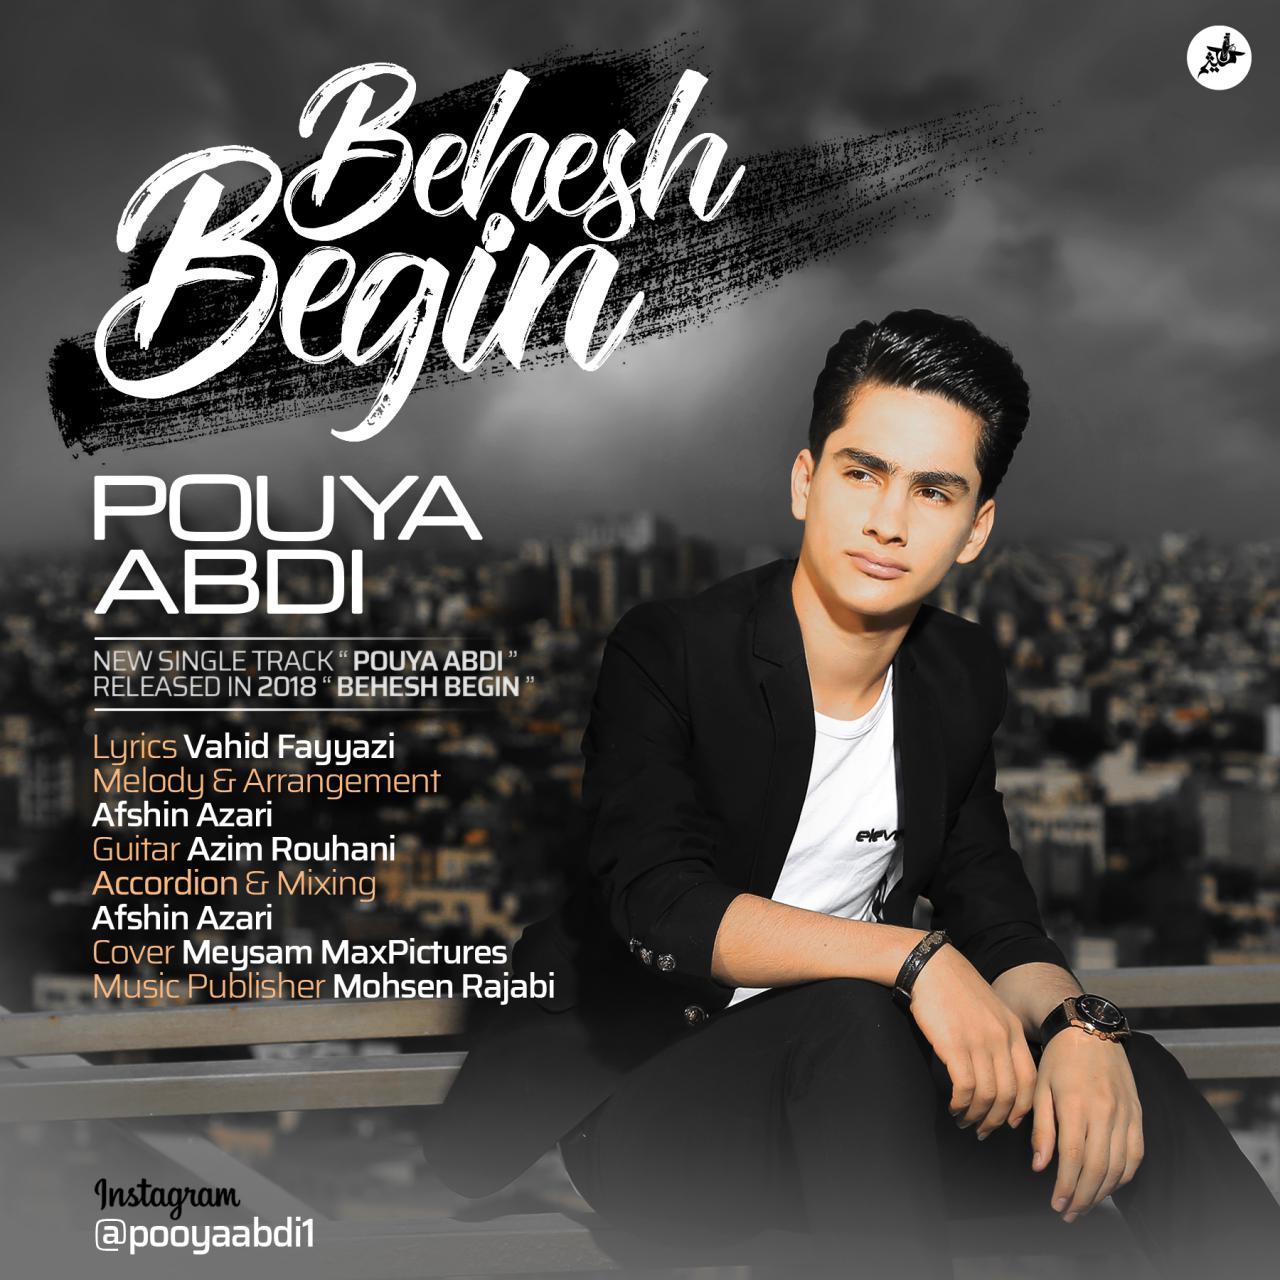 Pouya Abdi Behesh Begin - دانلود آهنگ جدید پویا عبدی بنام بهش بگین